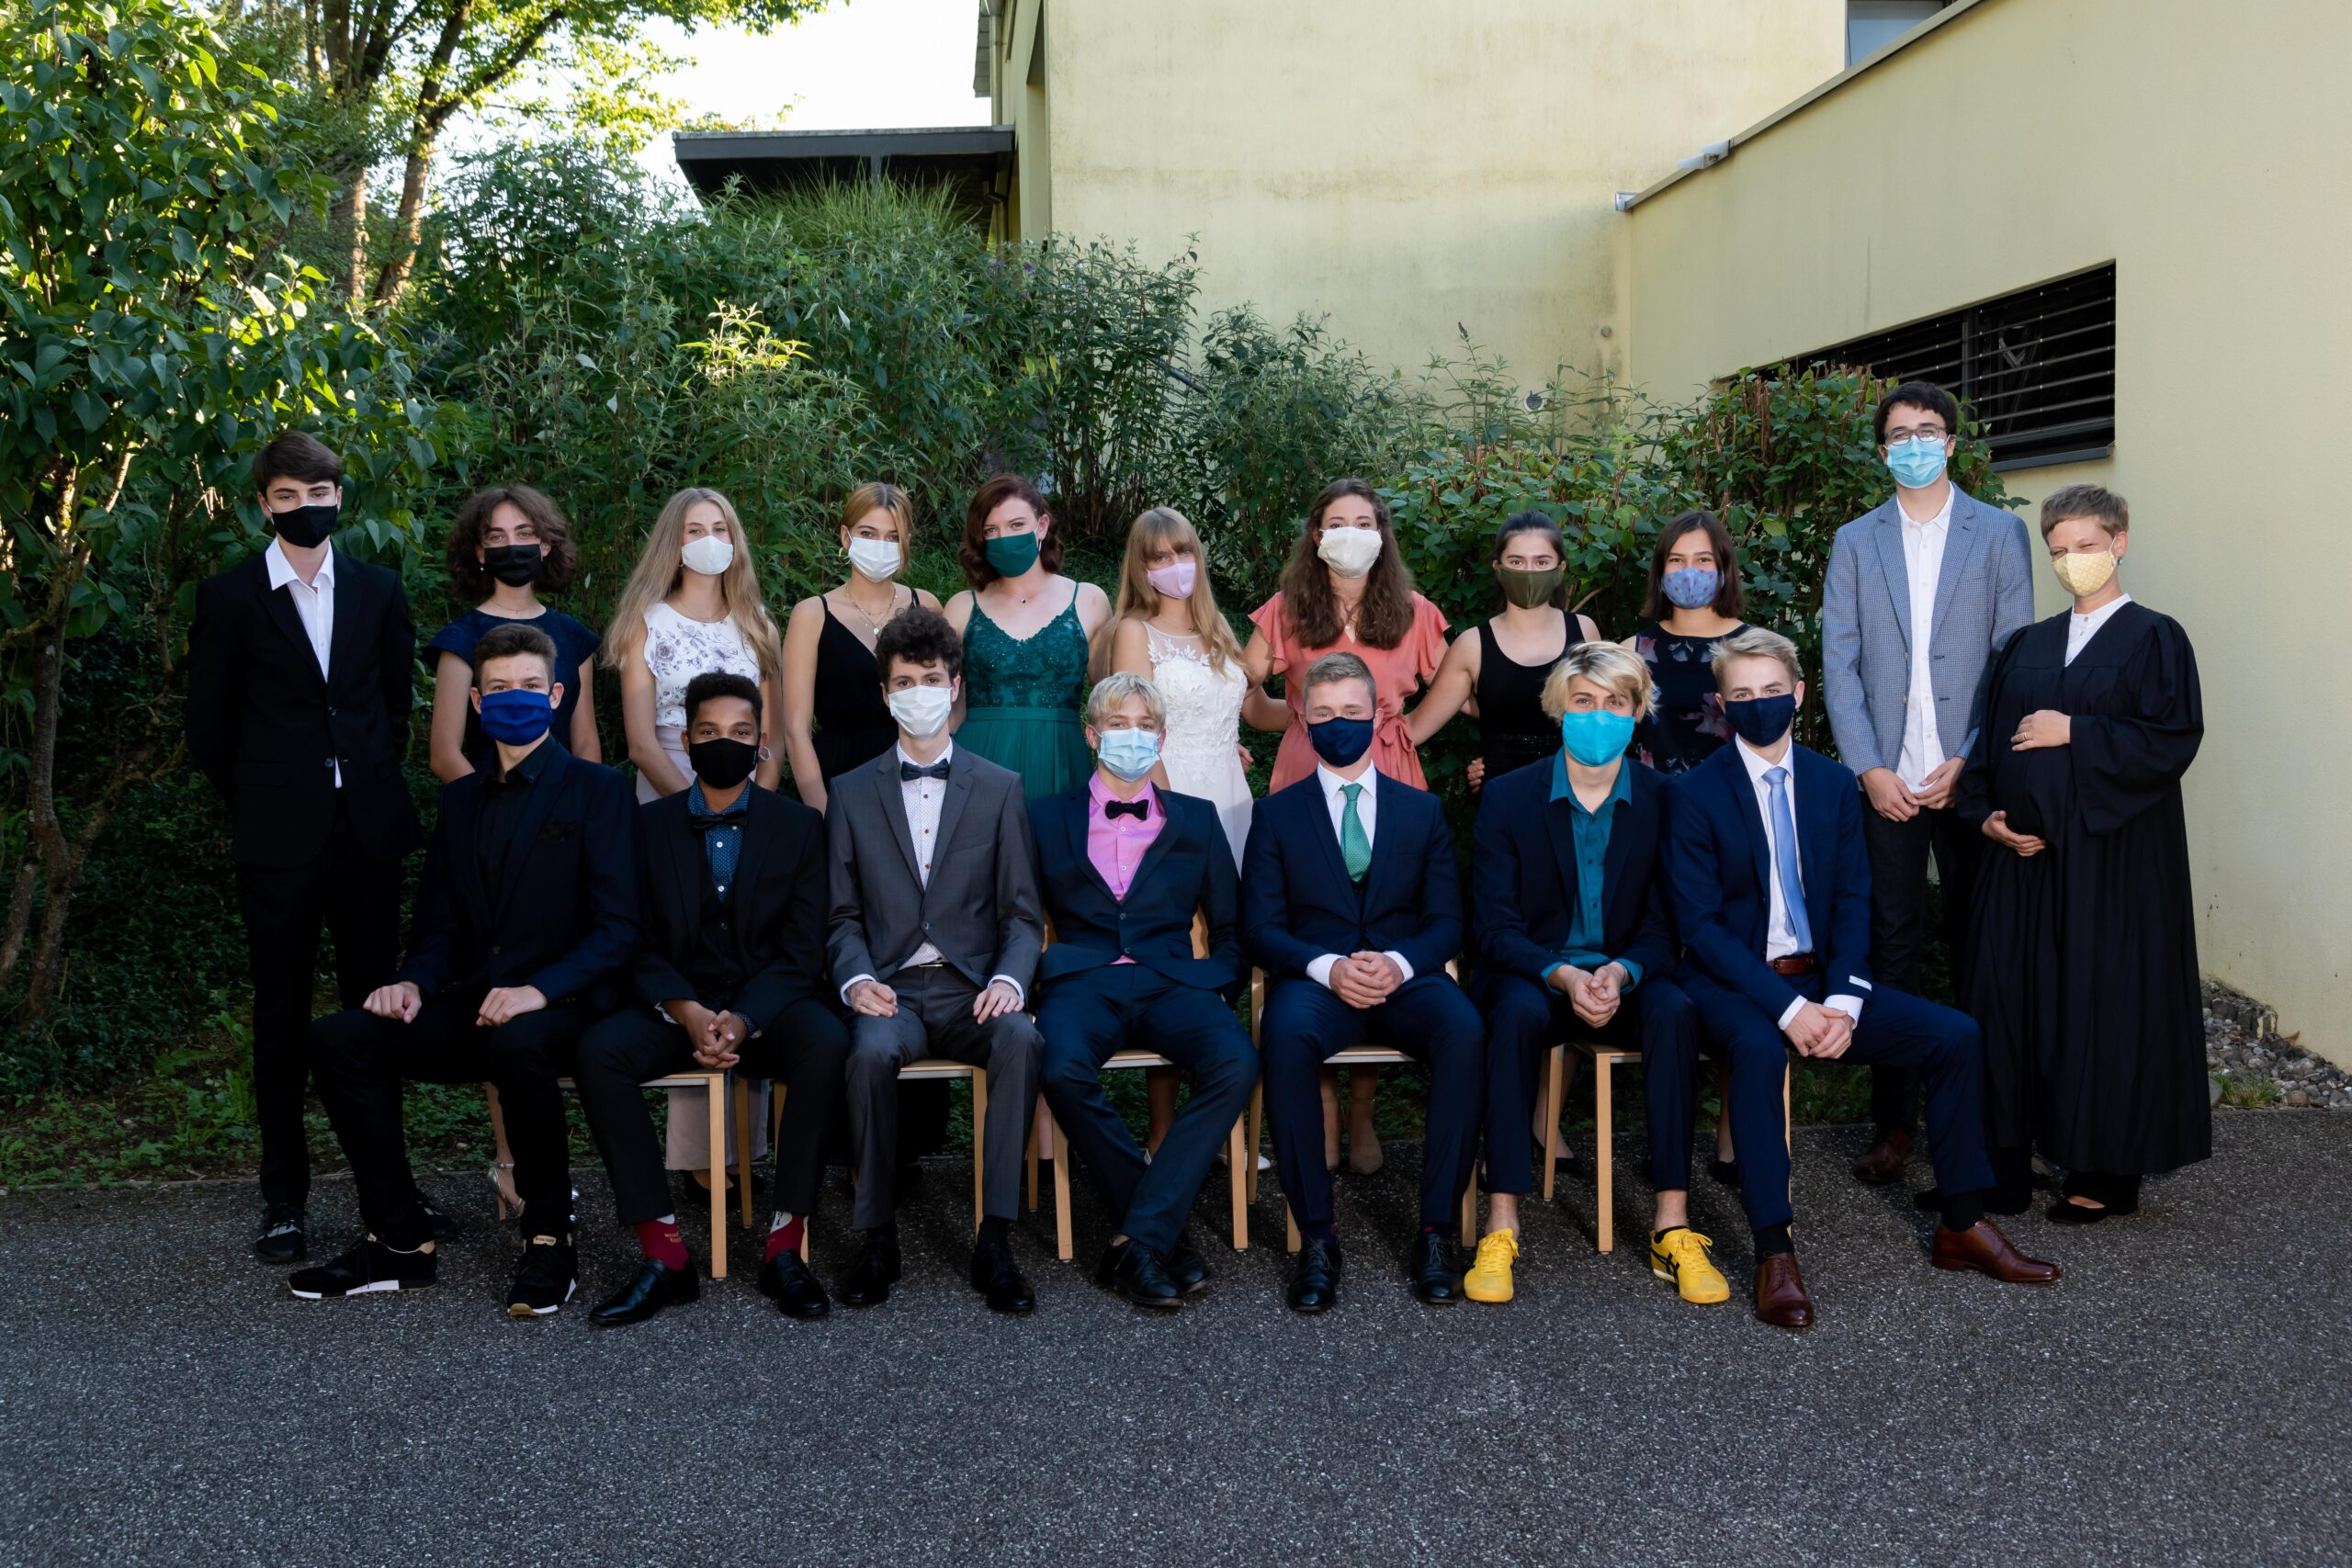 Gruppenfoto_Konf_Zwicky_mit-Maske-2020